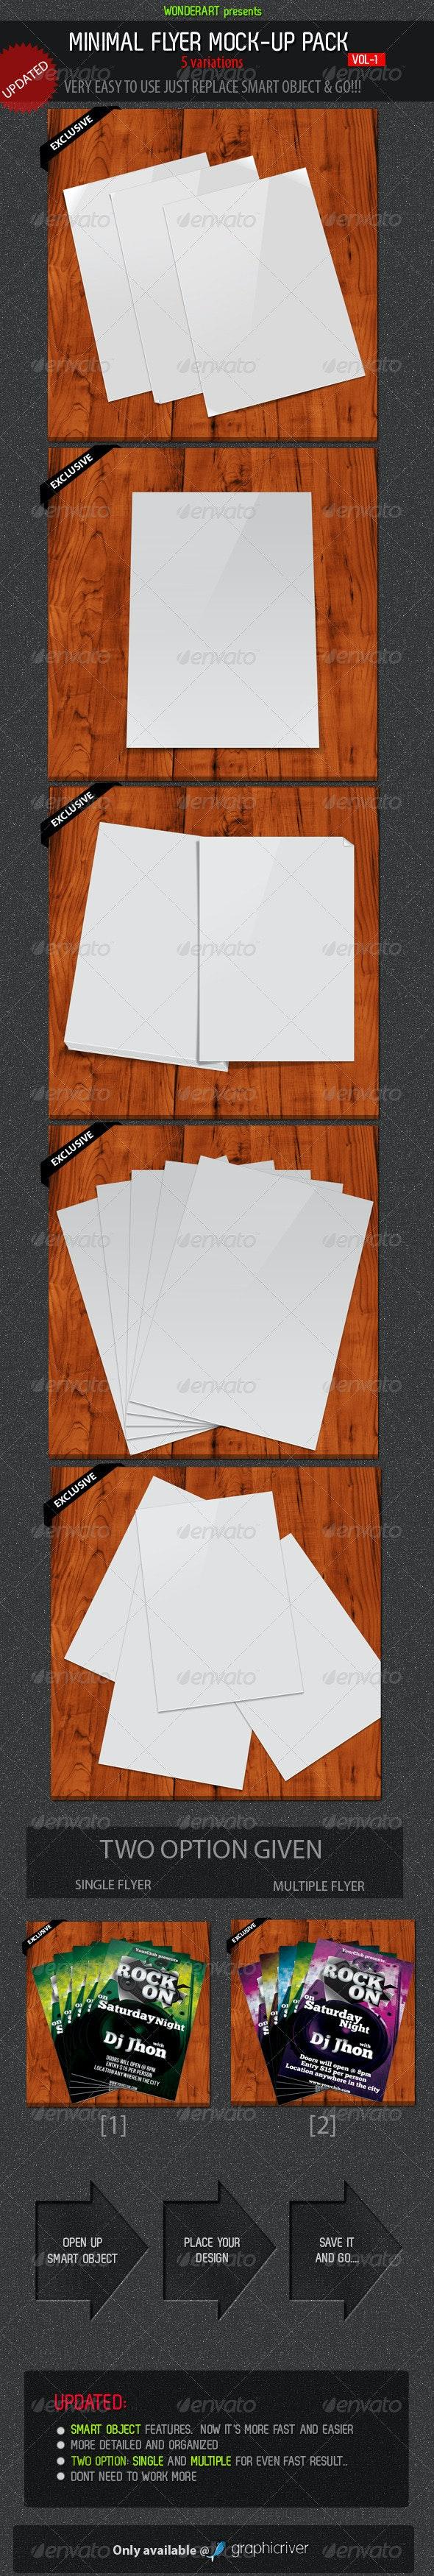 Minimal Flyer Mock-up Pack vol-1 - Flyers Print